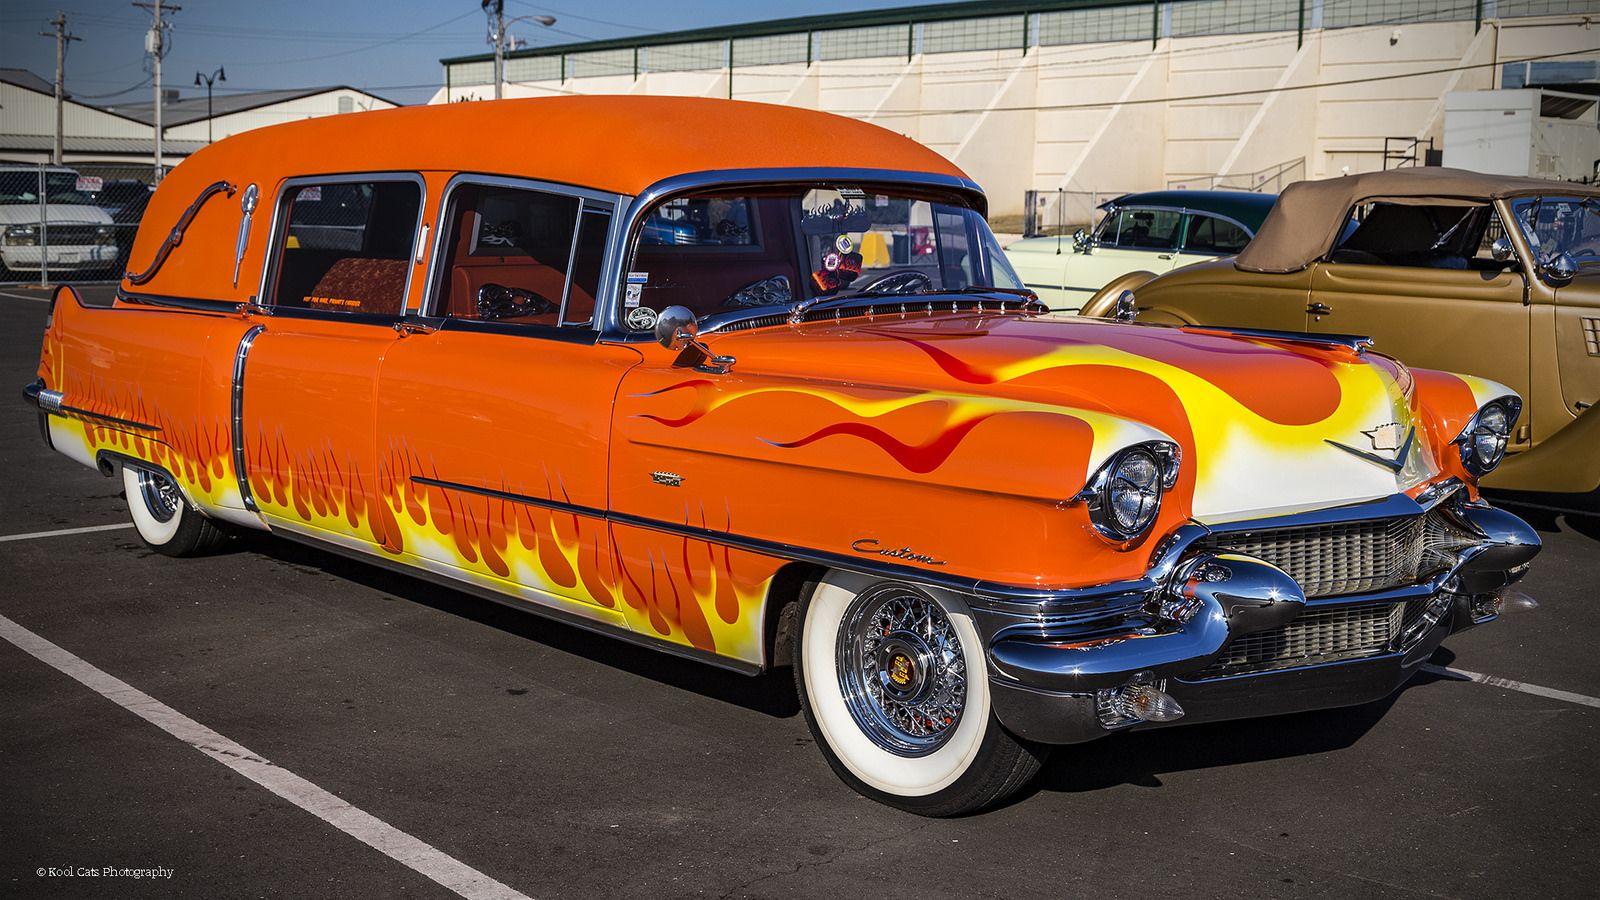 https://flic.kr/p/SvrHf5 | The Hearse | Custom Cadillac Hearse at the 2017 Southwest Hot Rod Nationals in Oklahoma City.